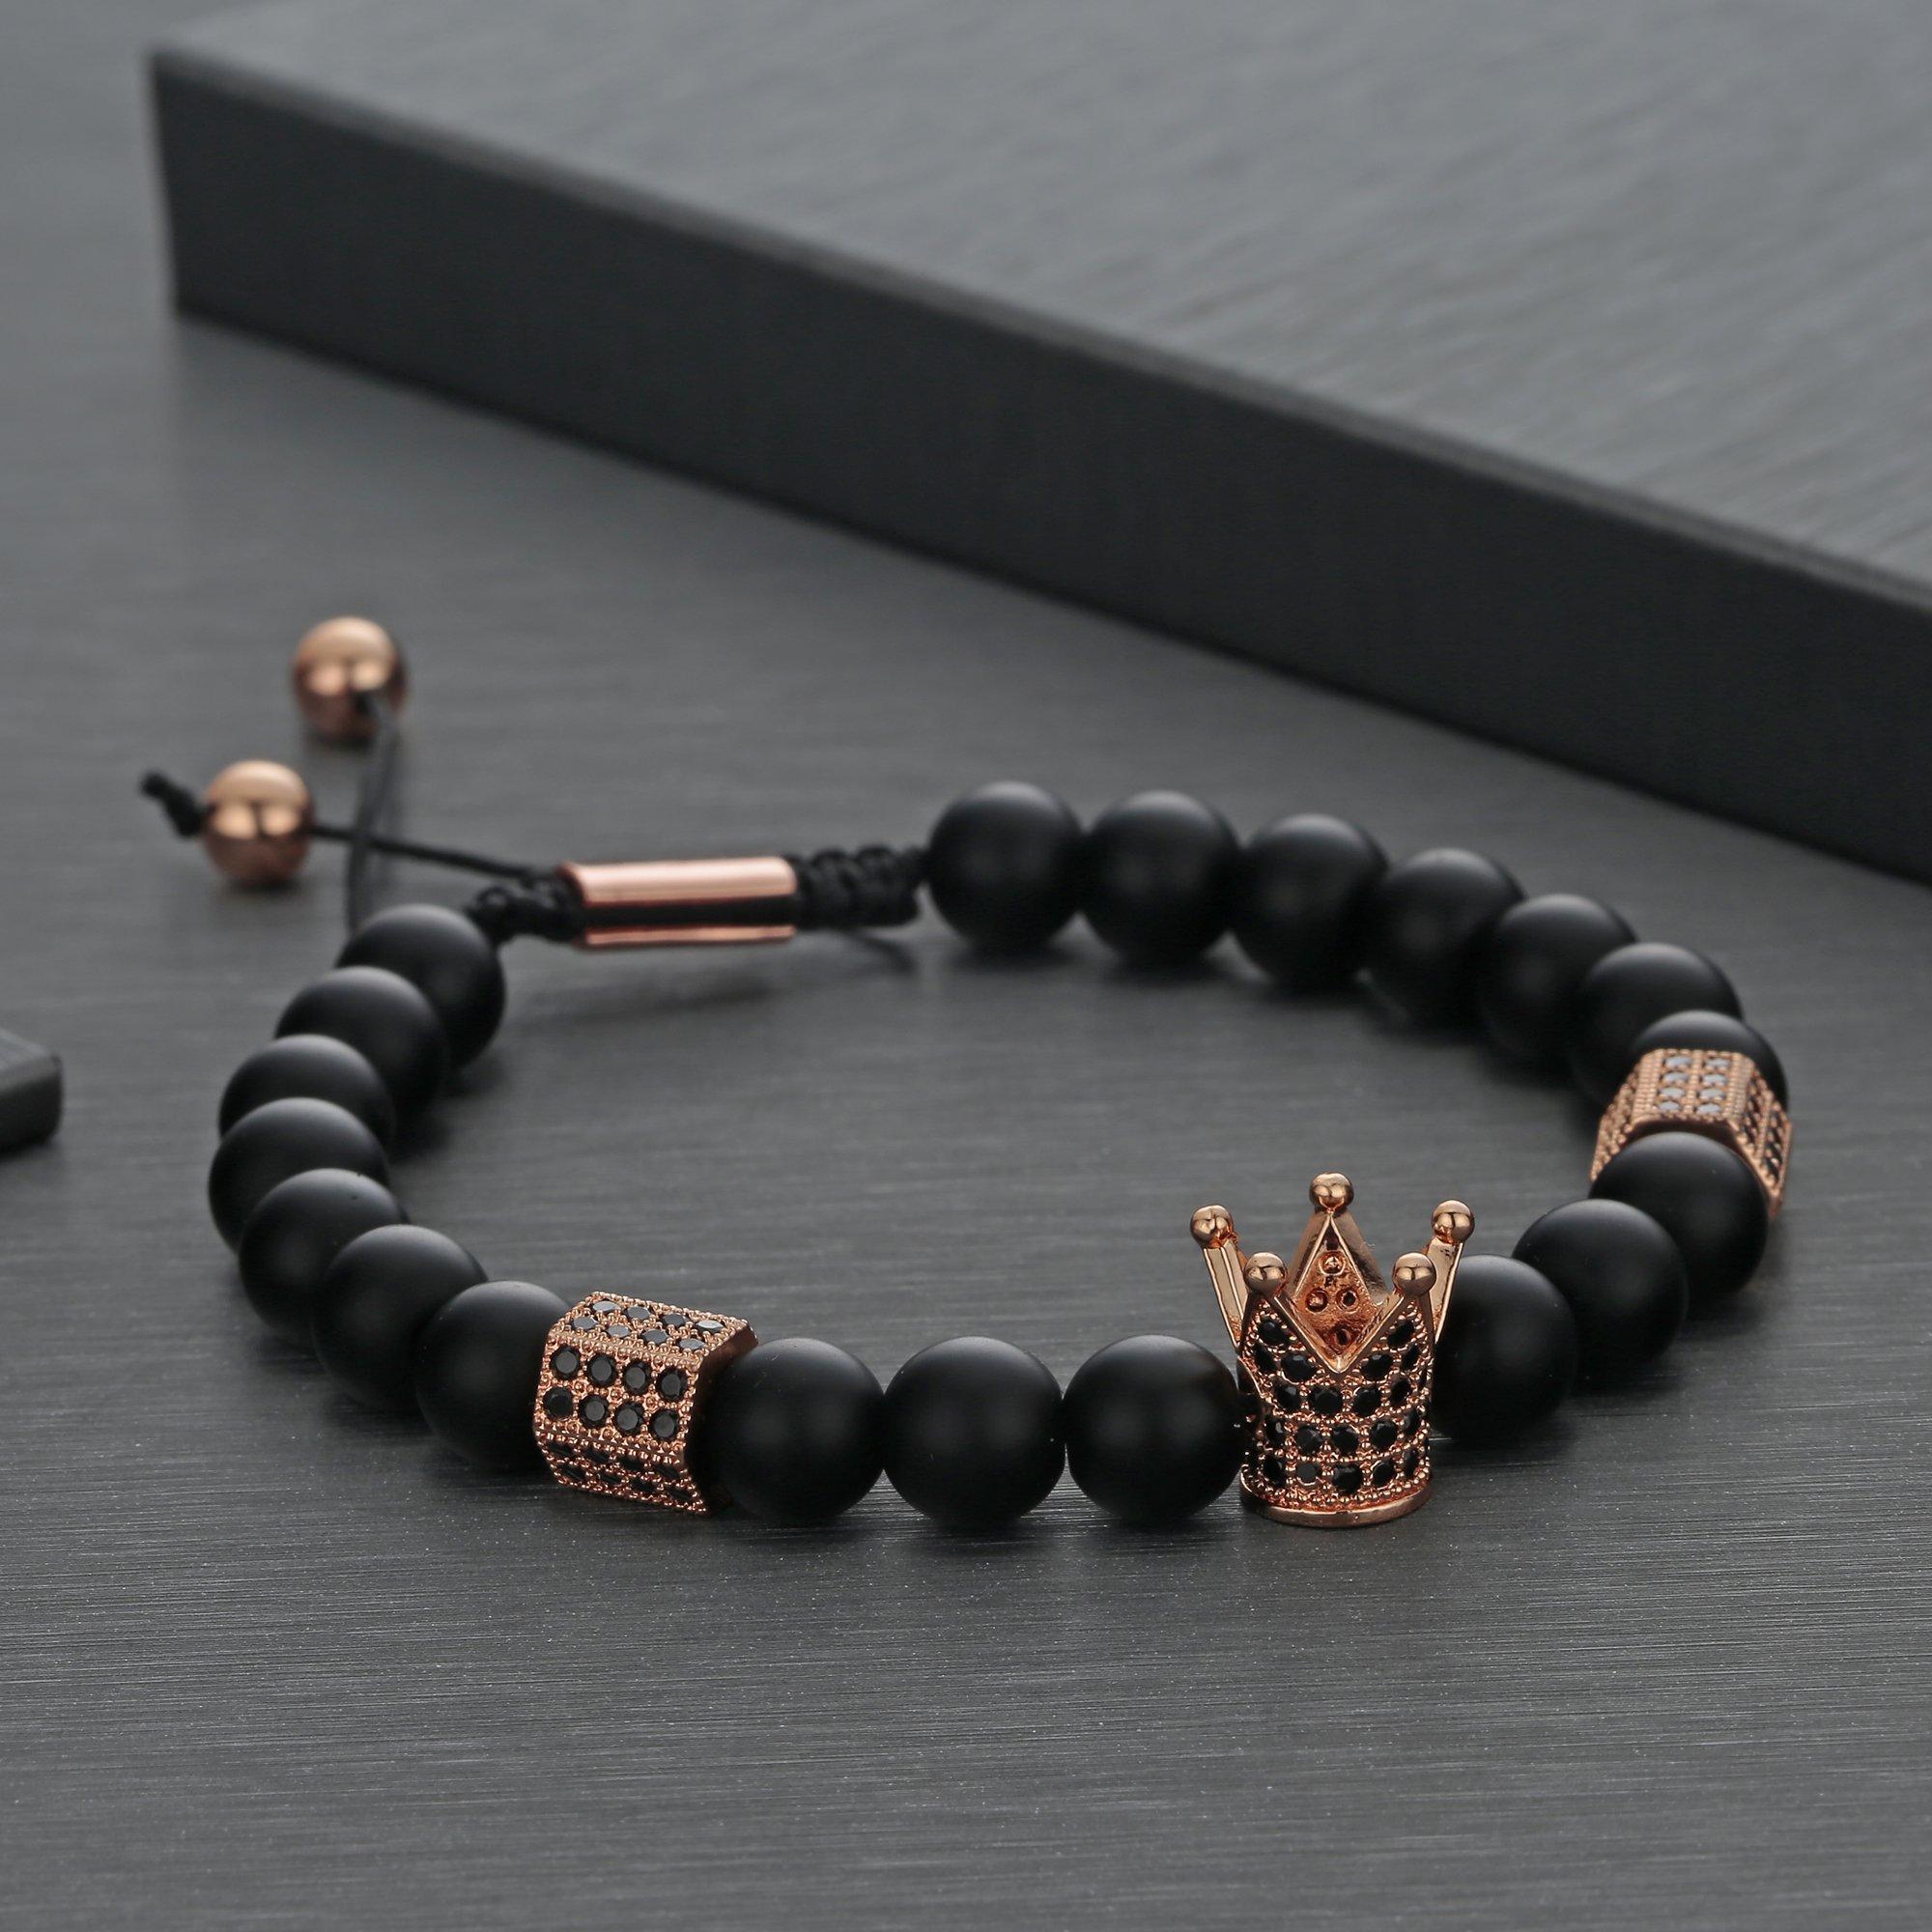 Joya Gift 8mm Black Matte Onyx Beads Rose Gold King Crown Braided Bracelet for Men with CZ Charm